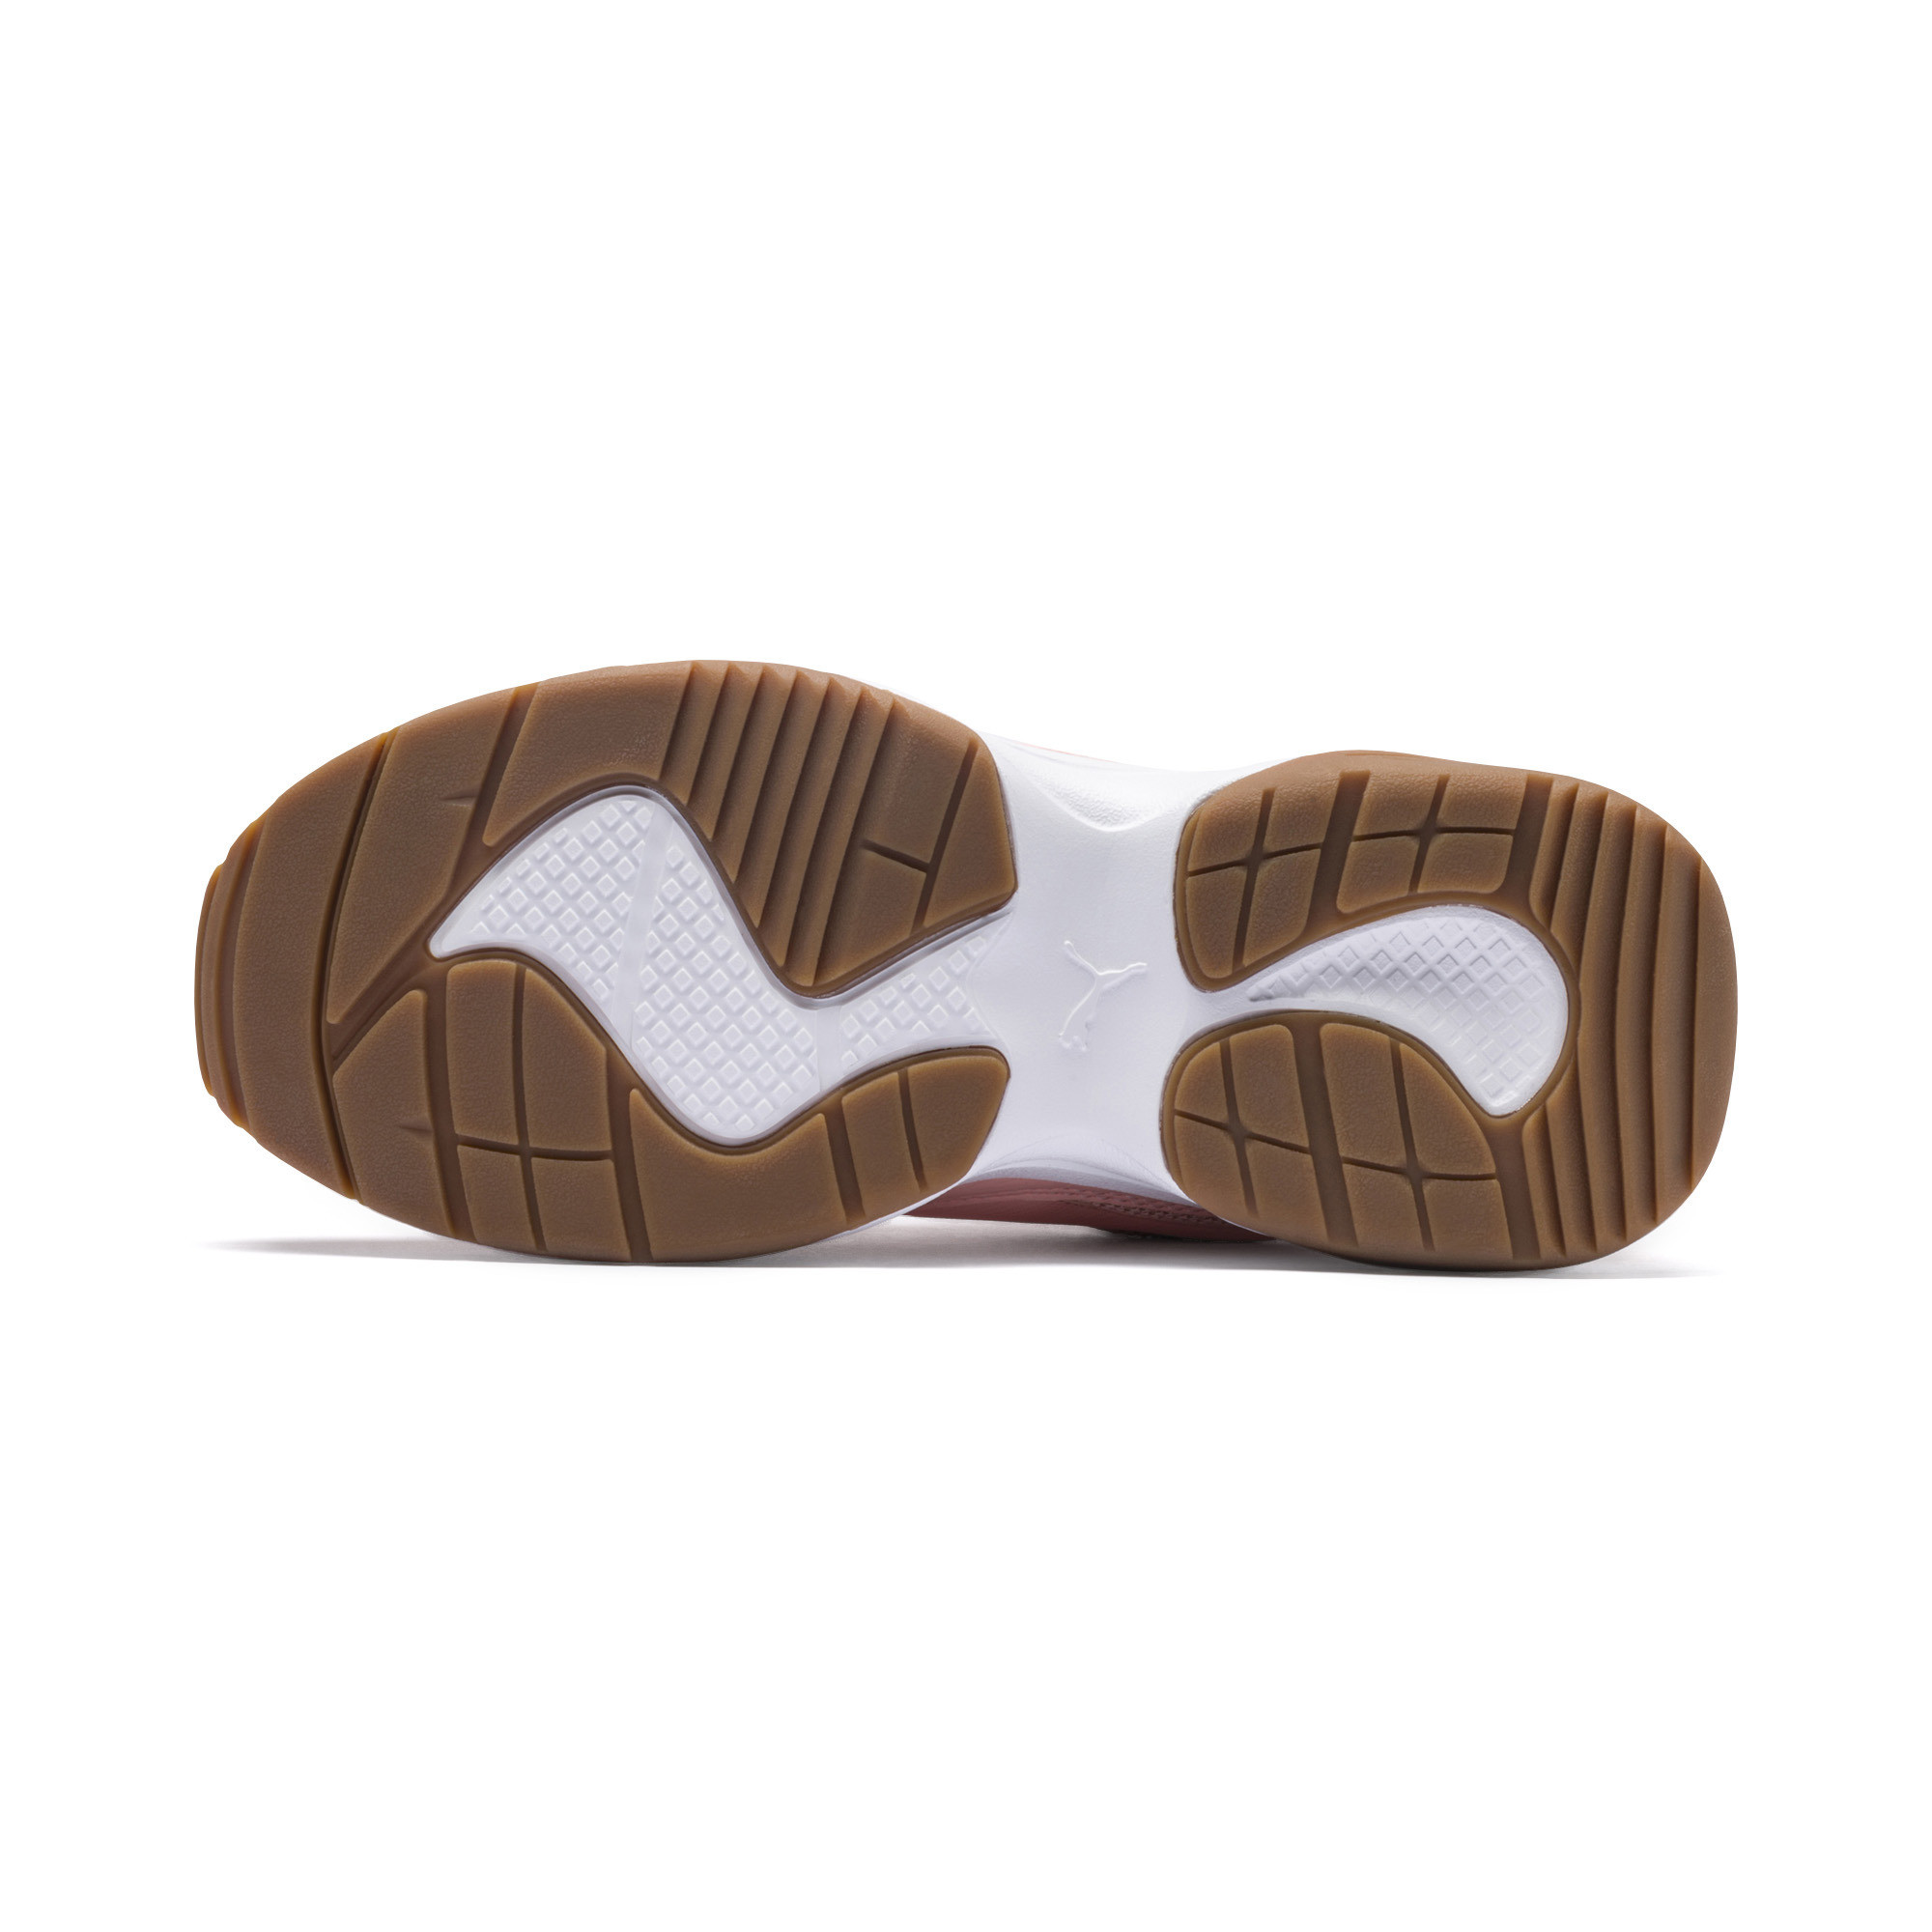 PUMA-Cilia-Women-039-s-Sneakers-Women-Shoe-Basics thumbnail 5